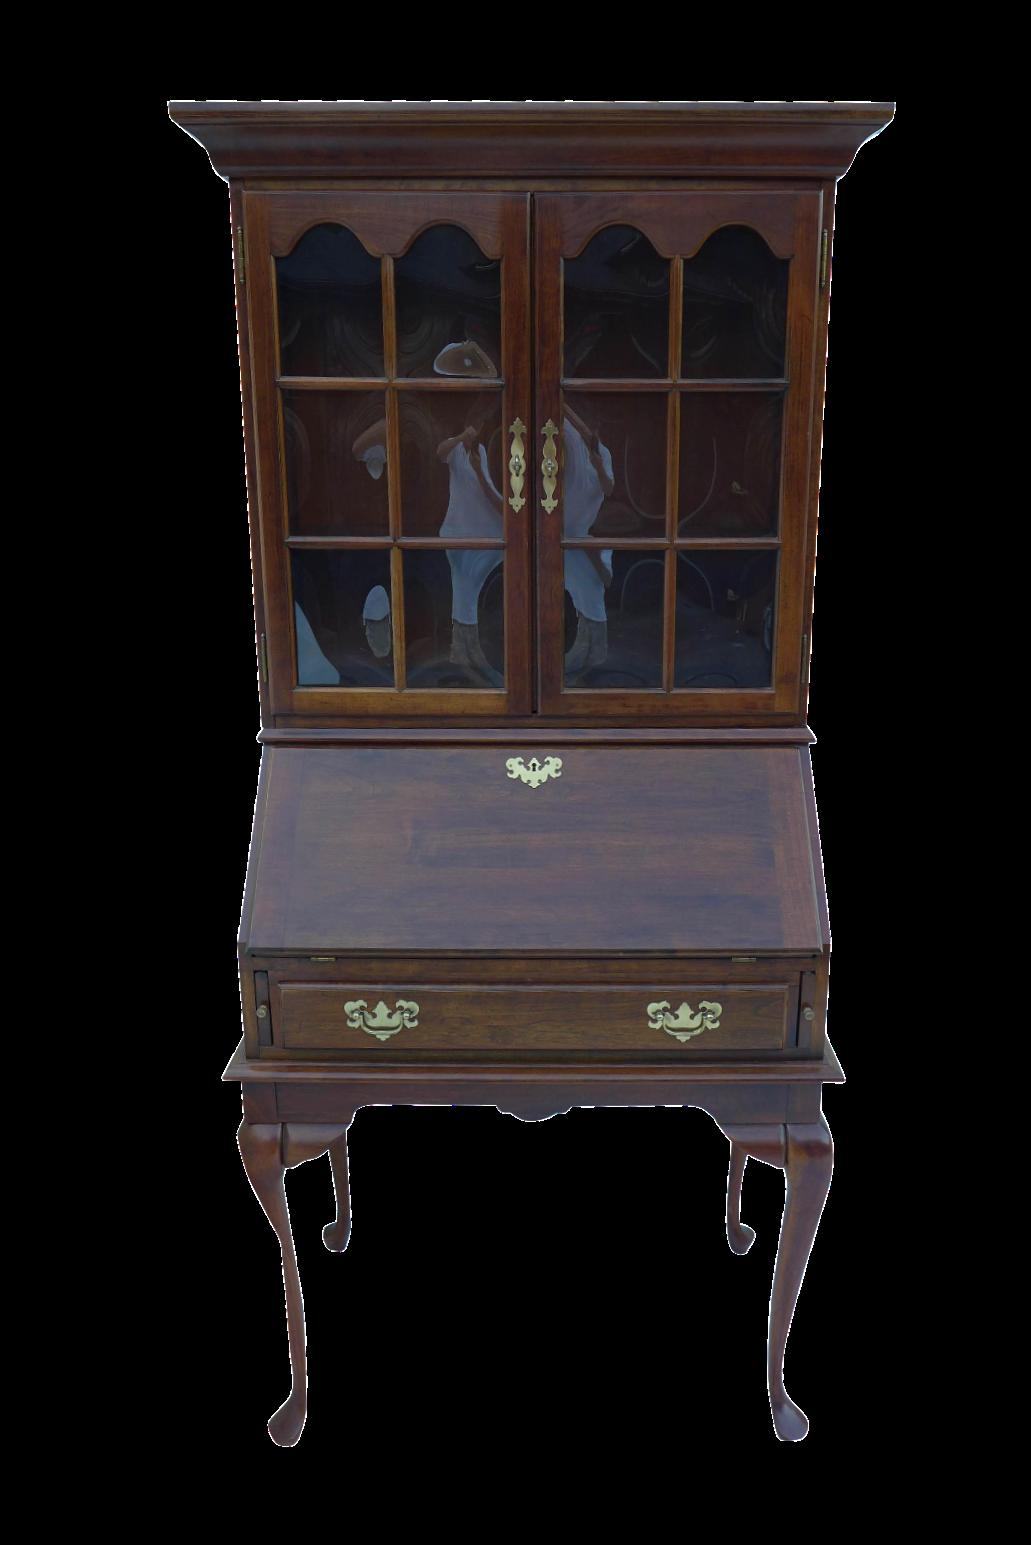 French Style Walnut Wood Secretary Desk 2 Pieces Chairish